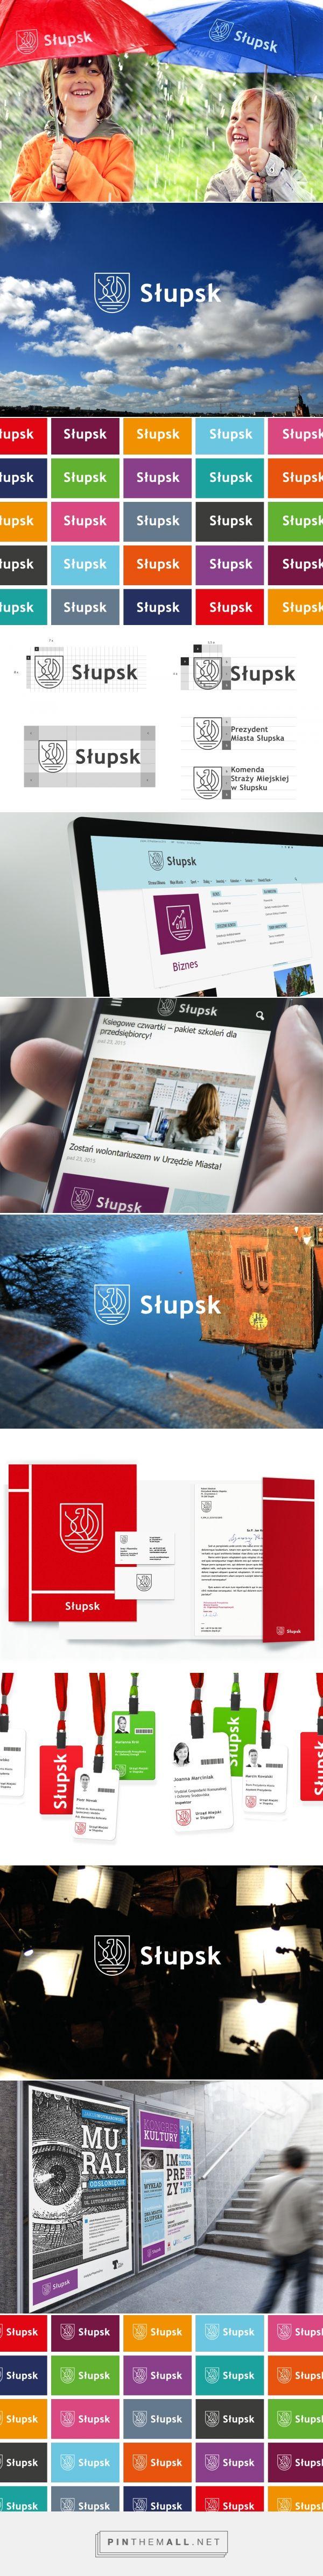 Słupsk on Behance - created via https://pinthemall.net